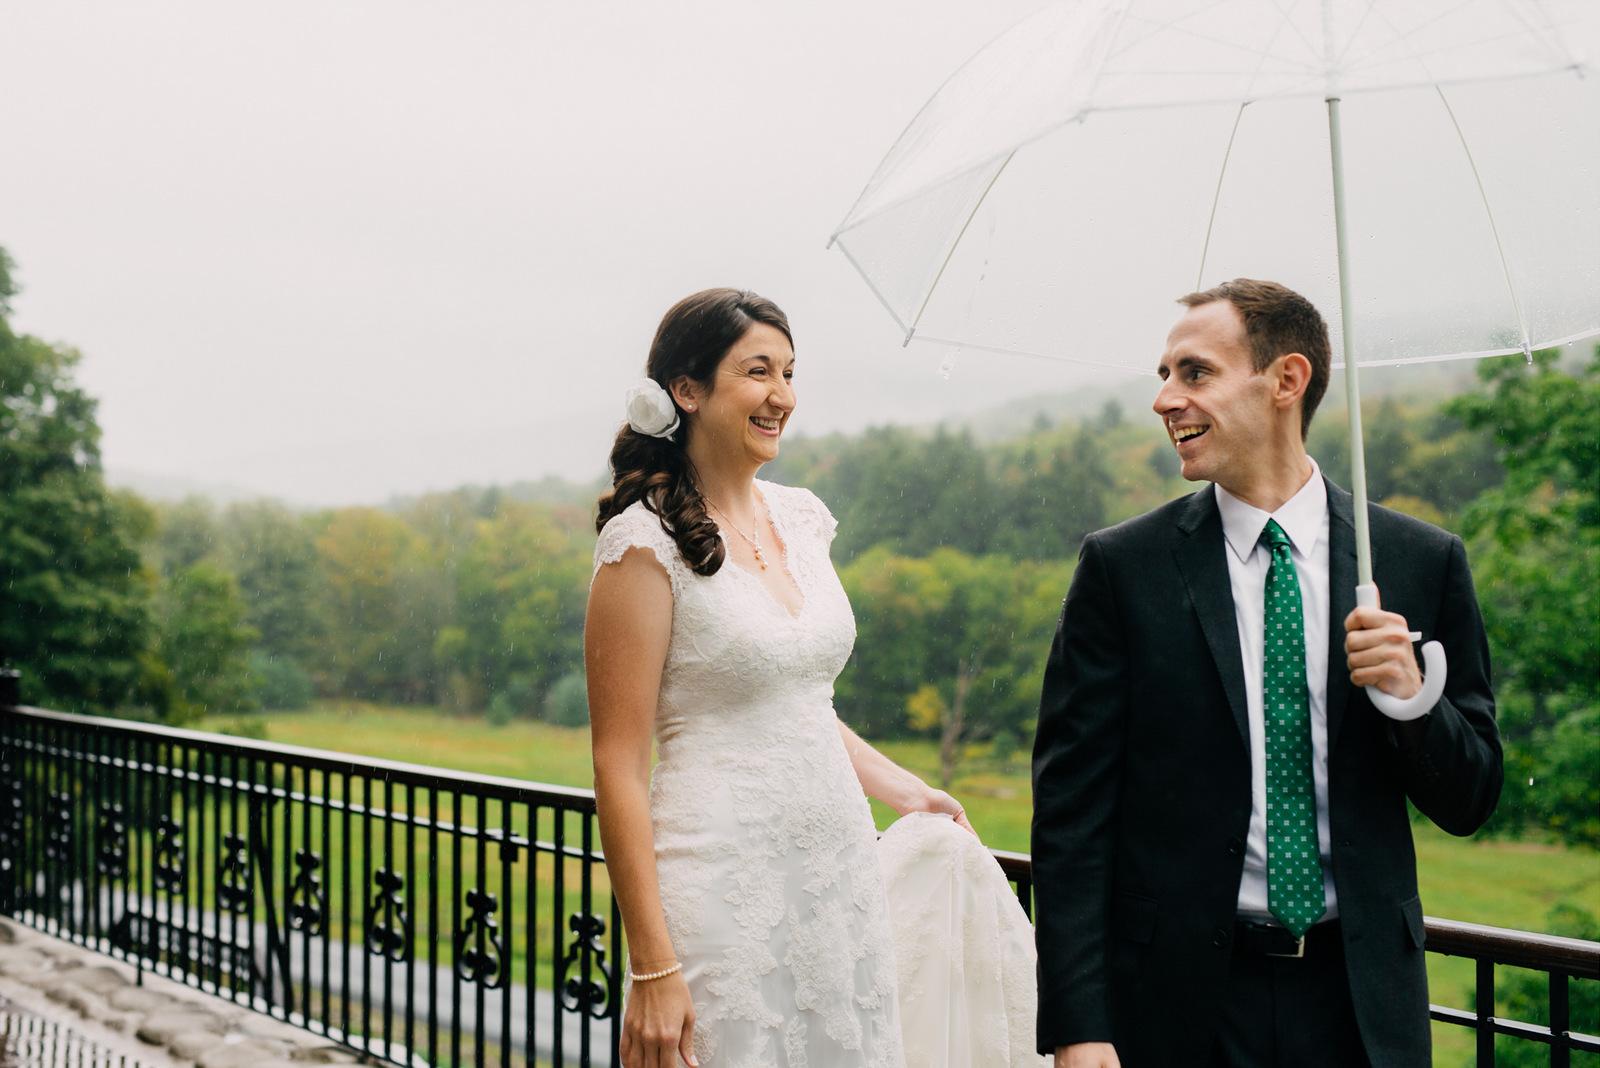 16-Emily Tebbetts Wedding Photography 6261--3.jpg